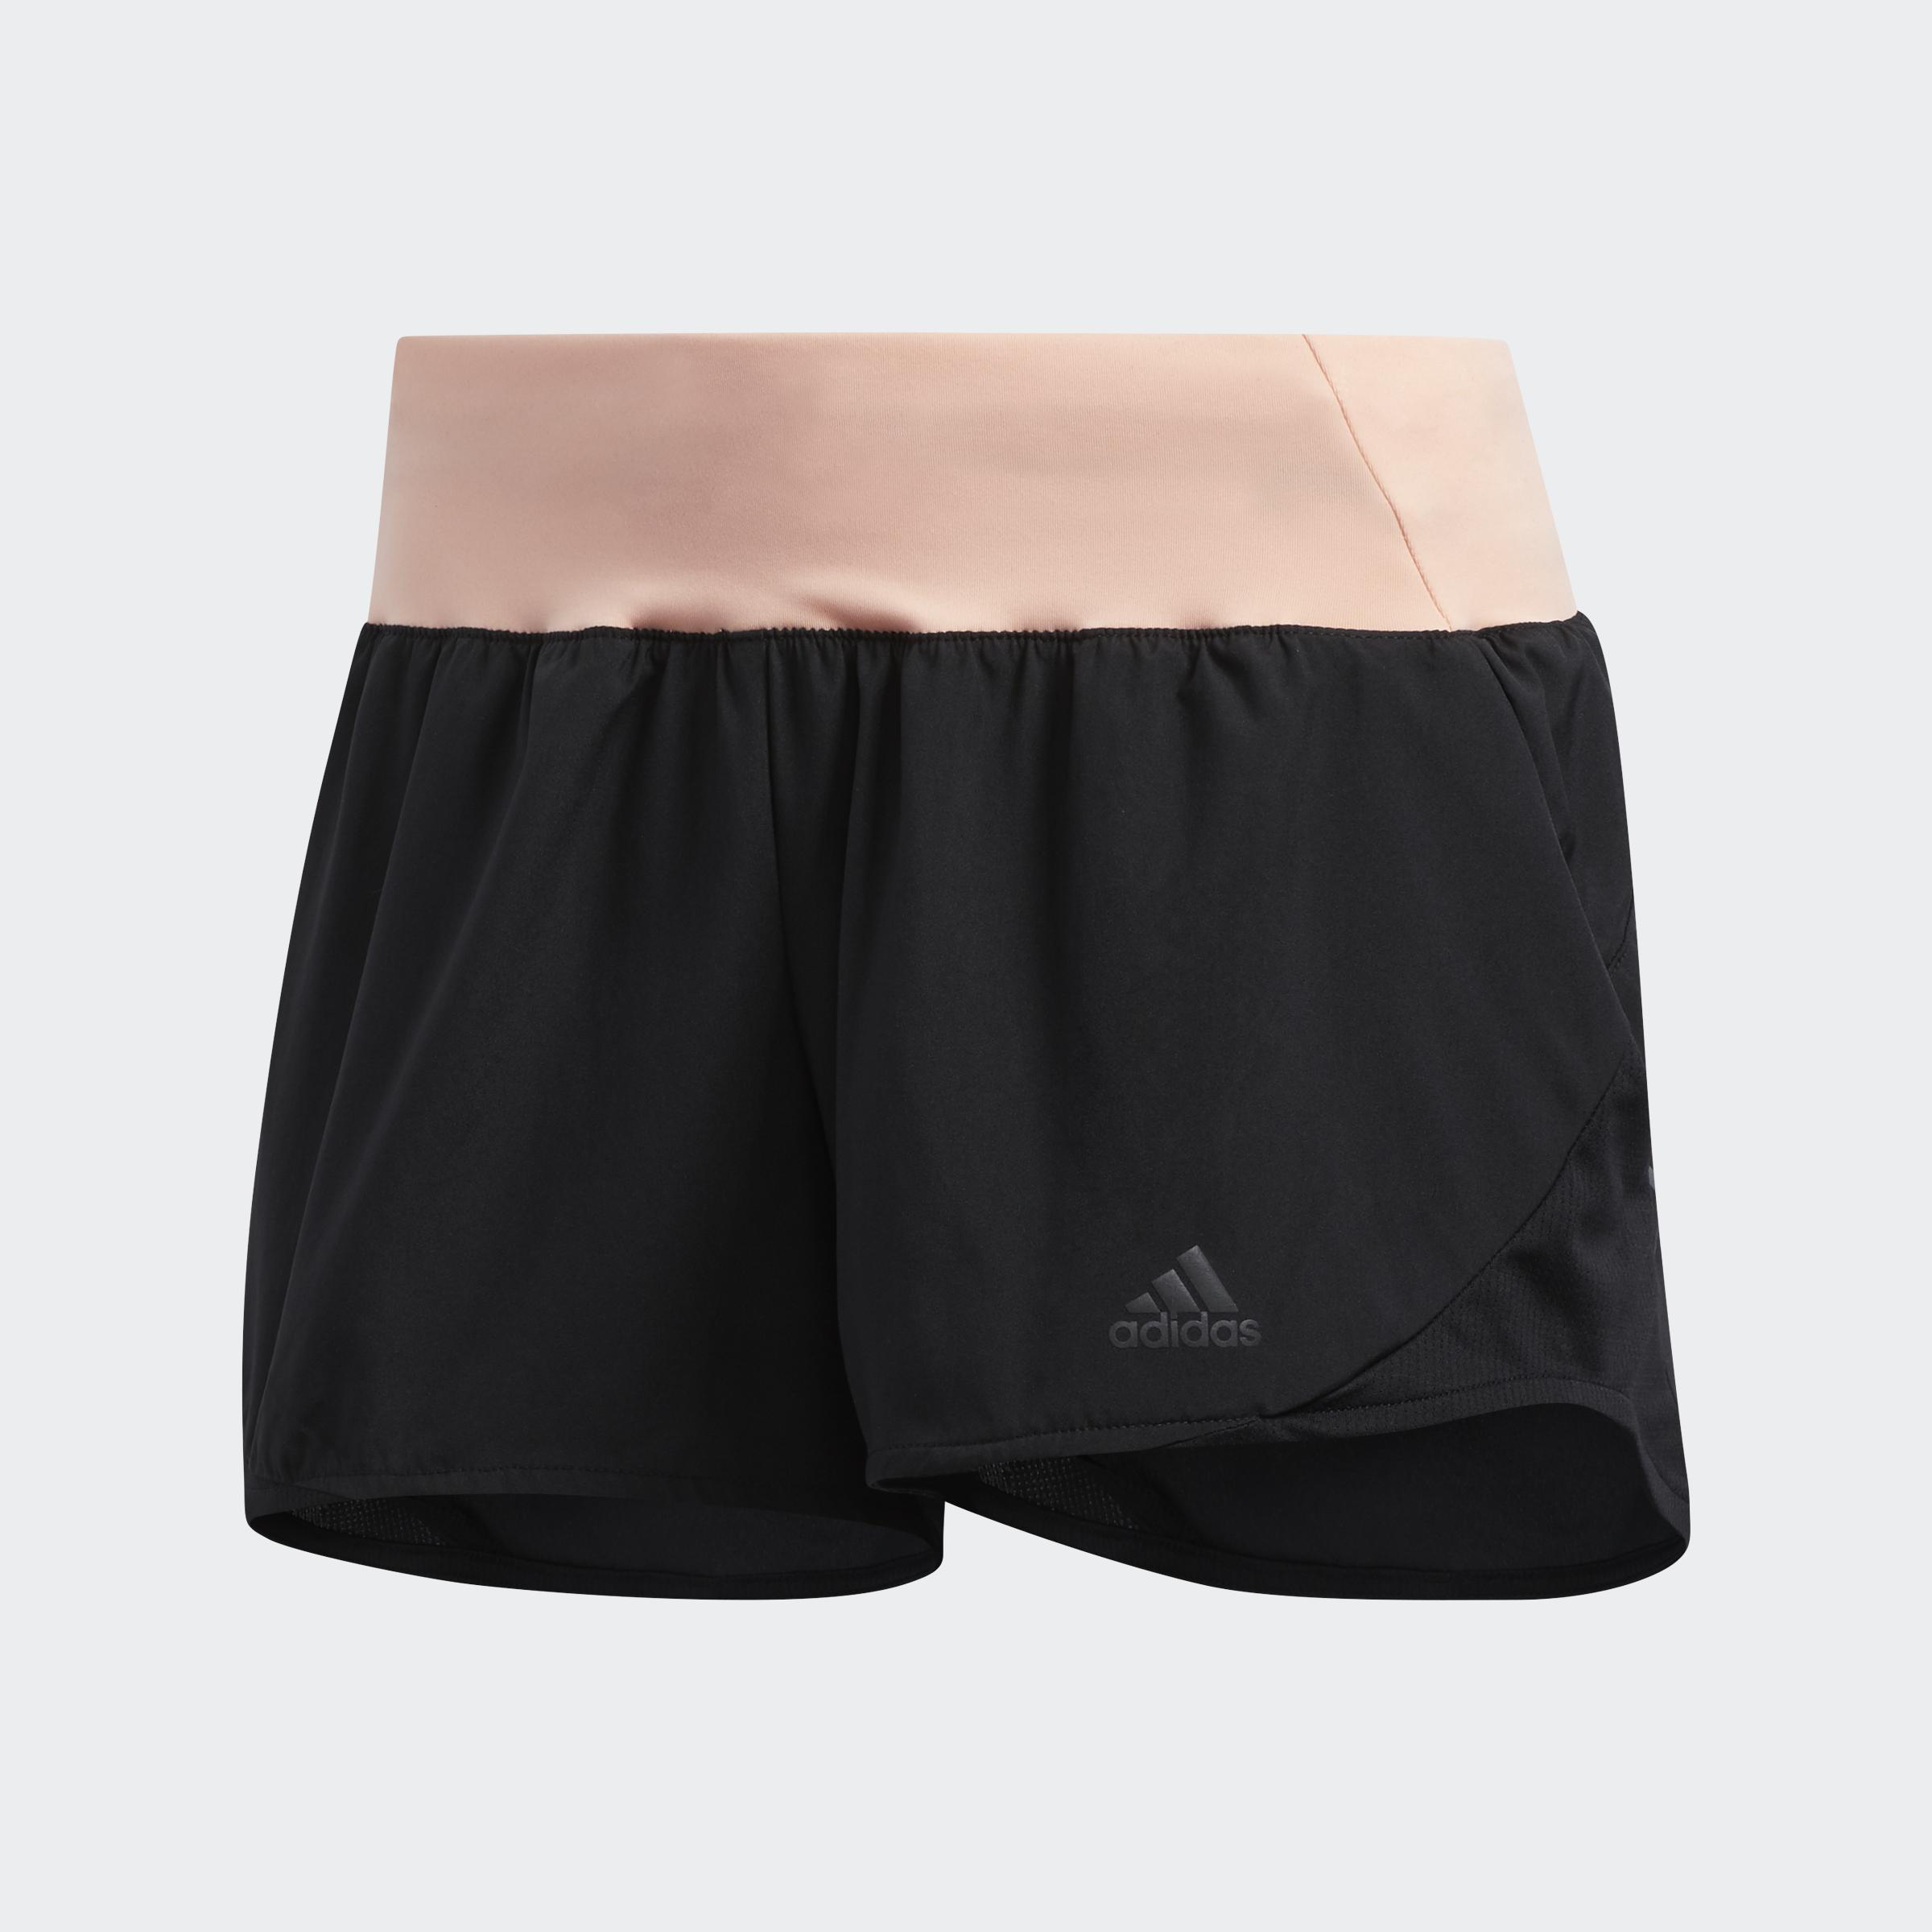 adidas-Run-It-Shorts-Women-039-s-Shorts thumbnail 23